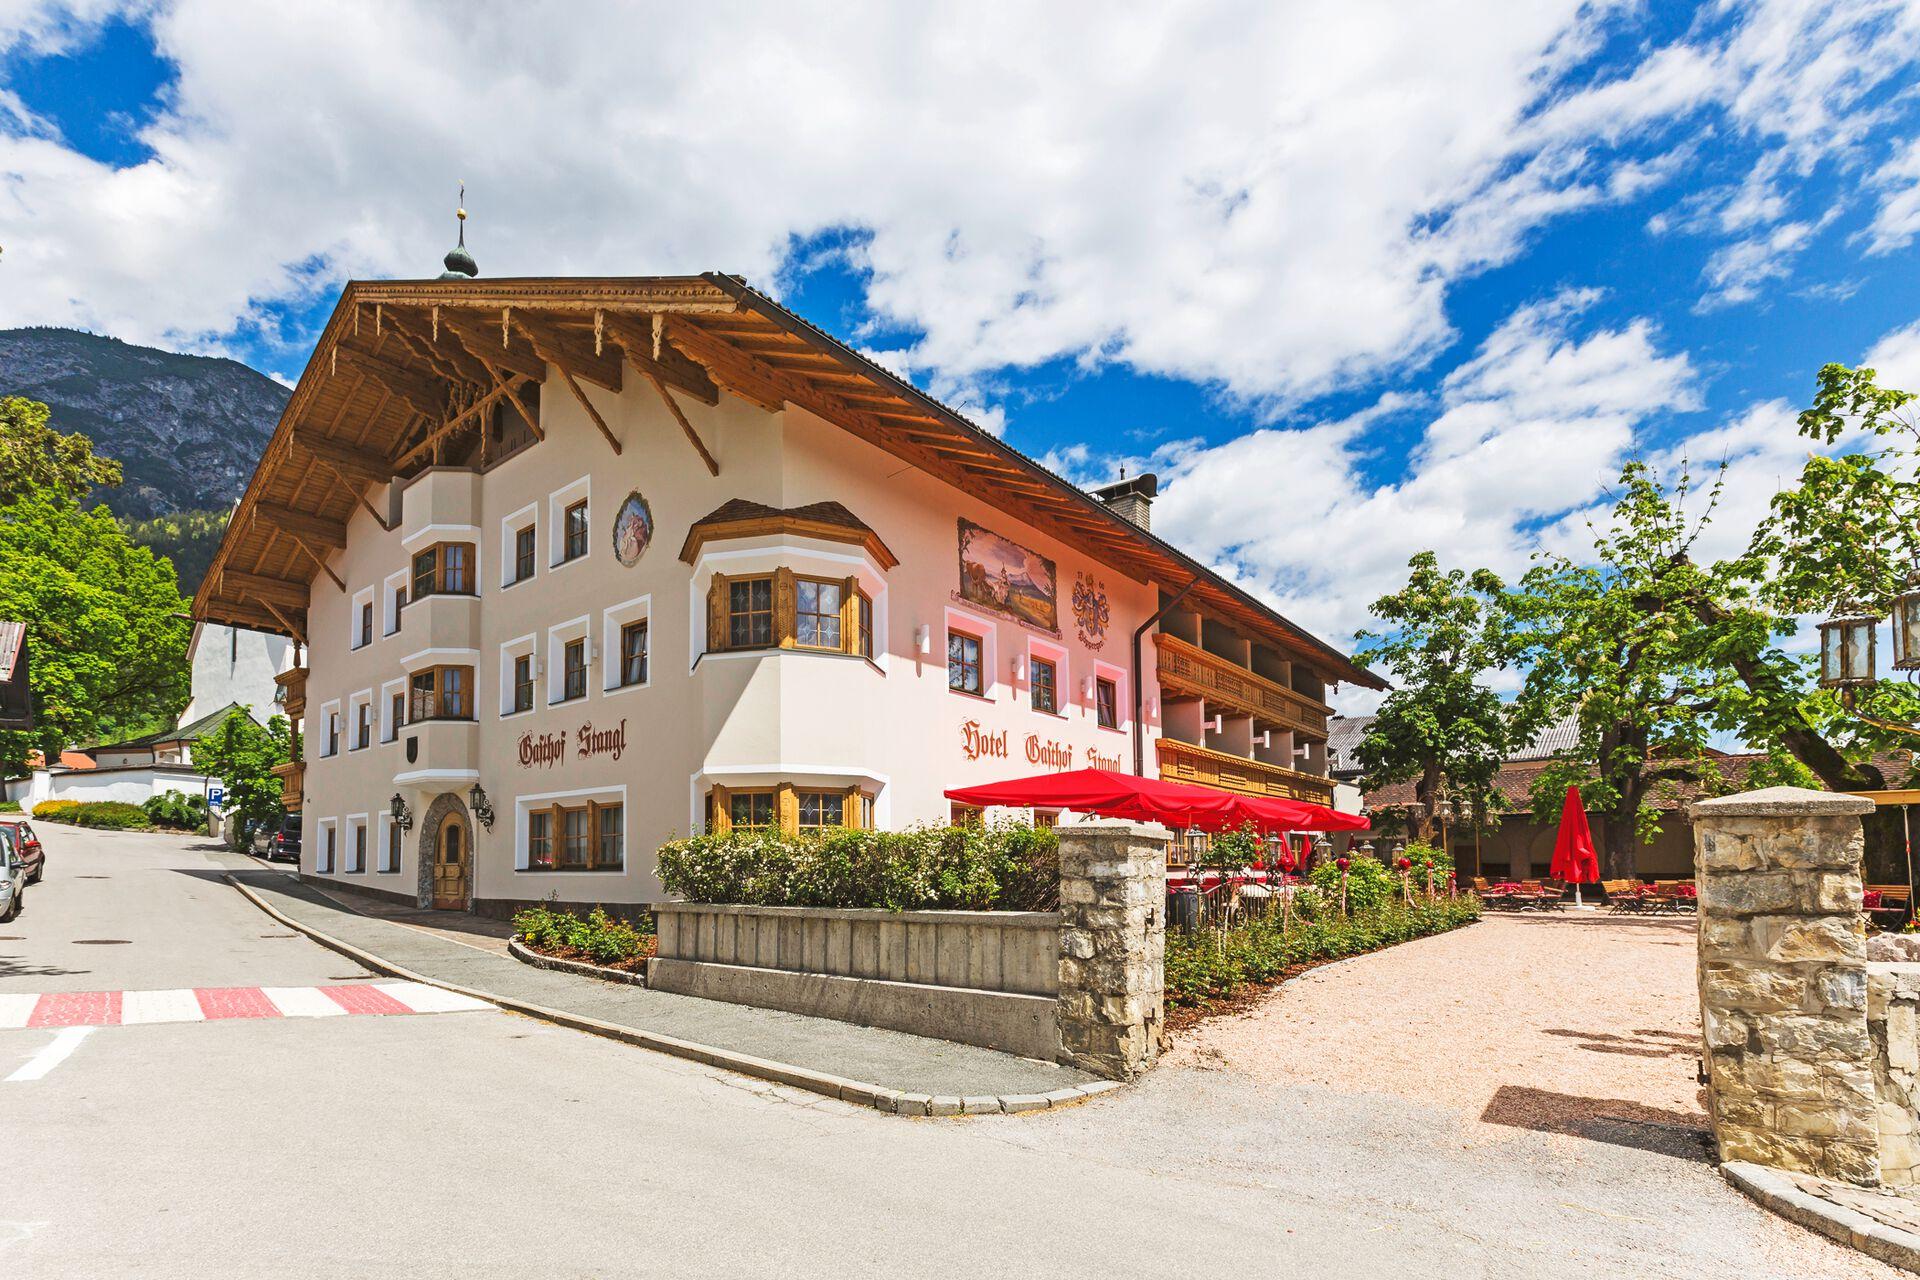 Hotel Gasthof Stangl